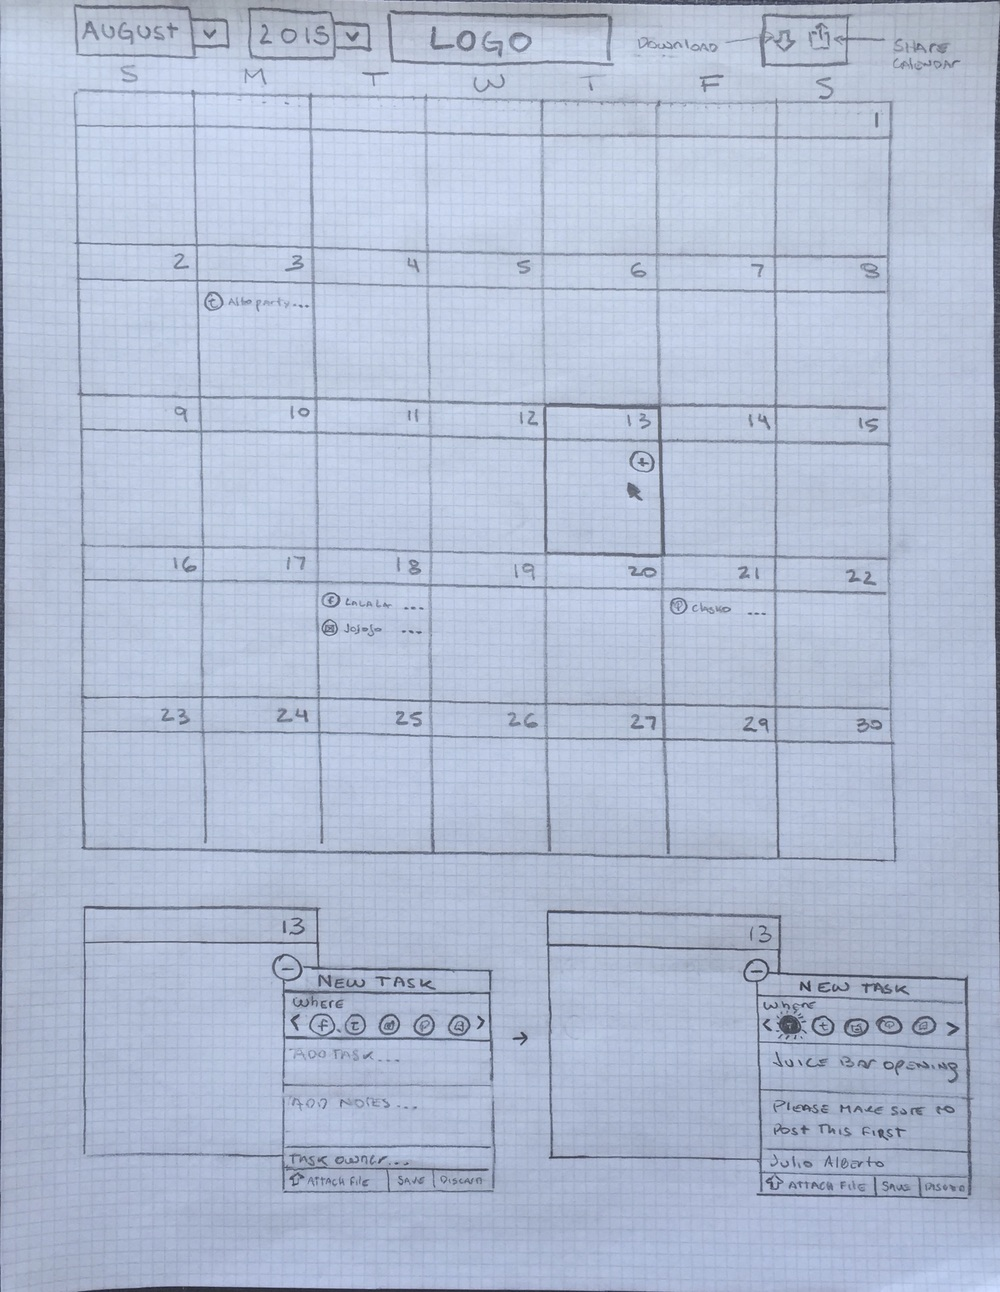 Bee Social Calendar copy.jpg